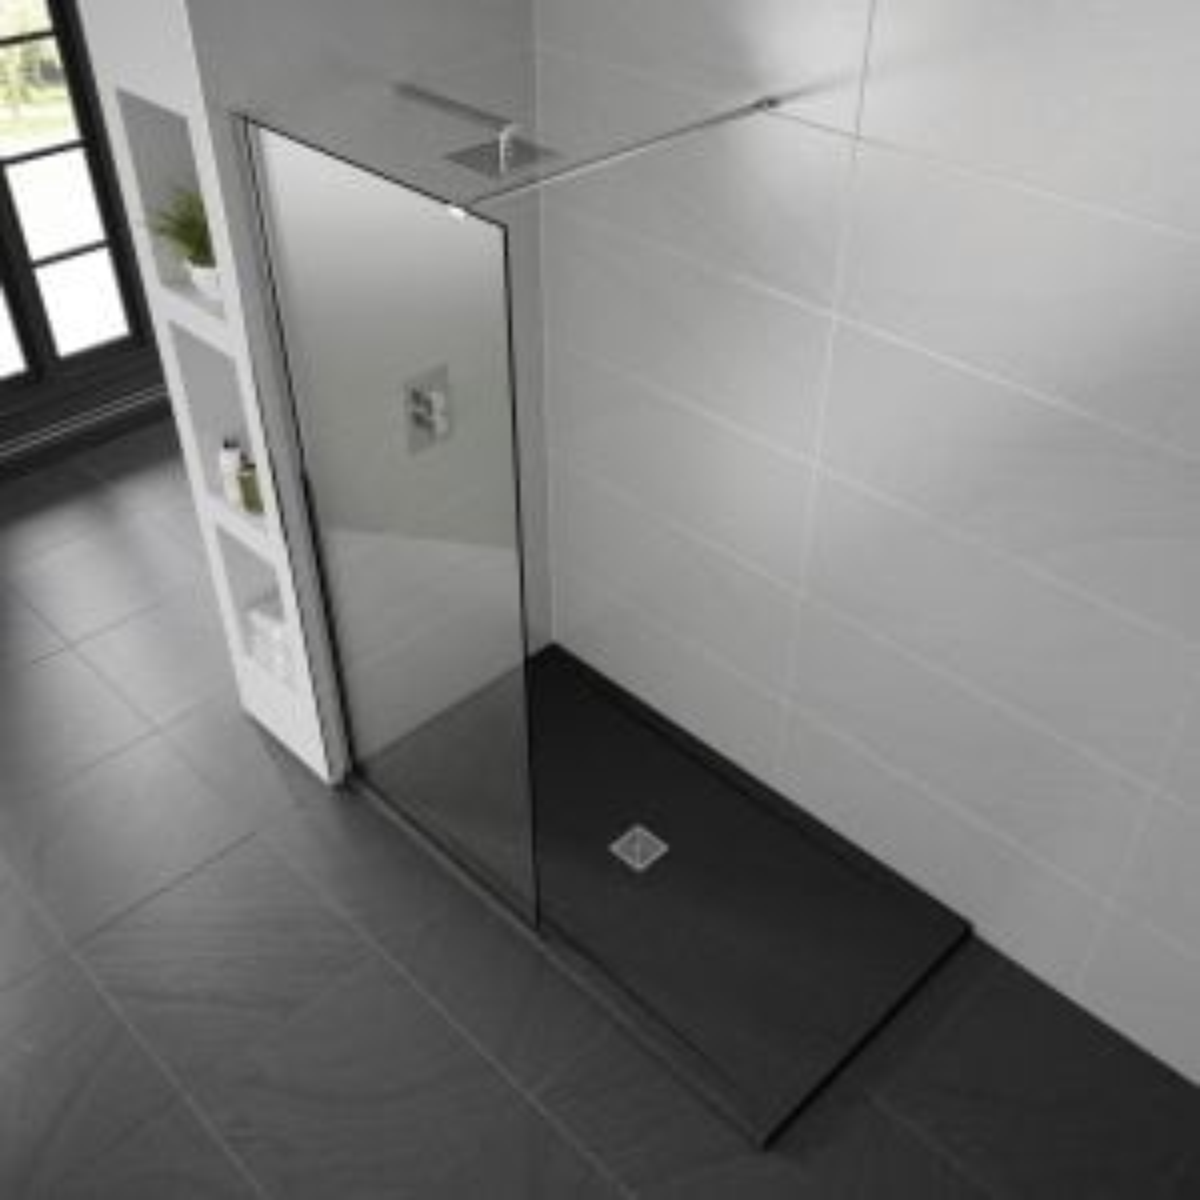 Aquadart Black Slate Shower Tray 1000 x 900 Lifestyle